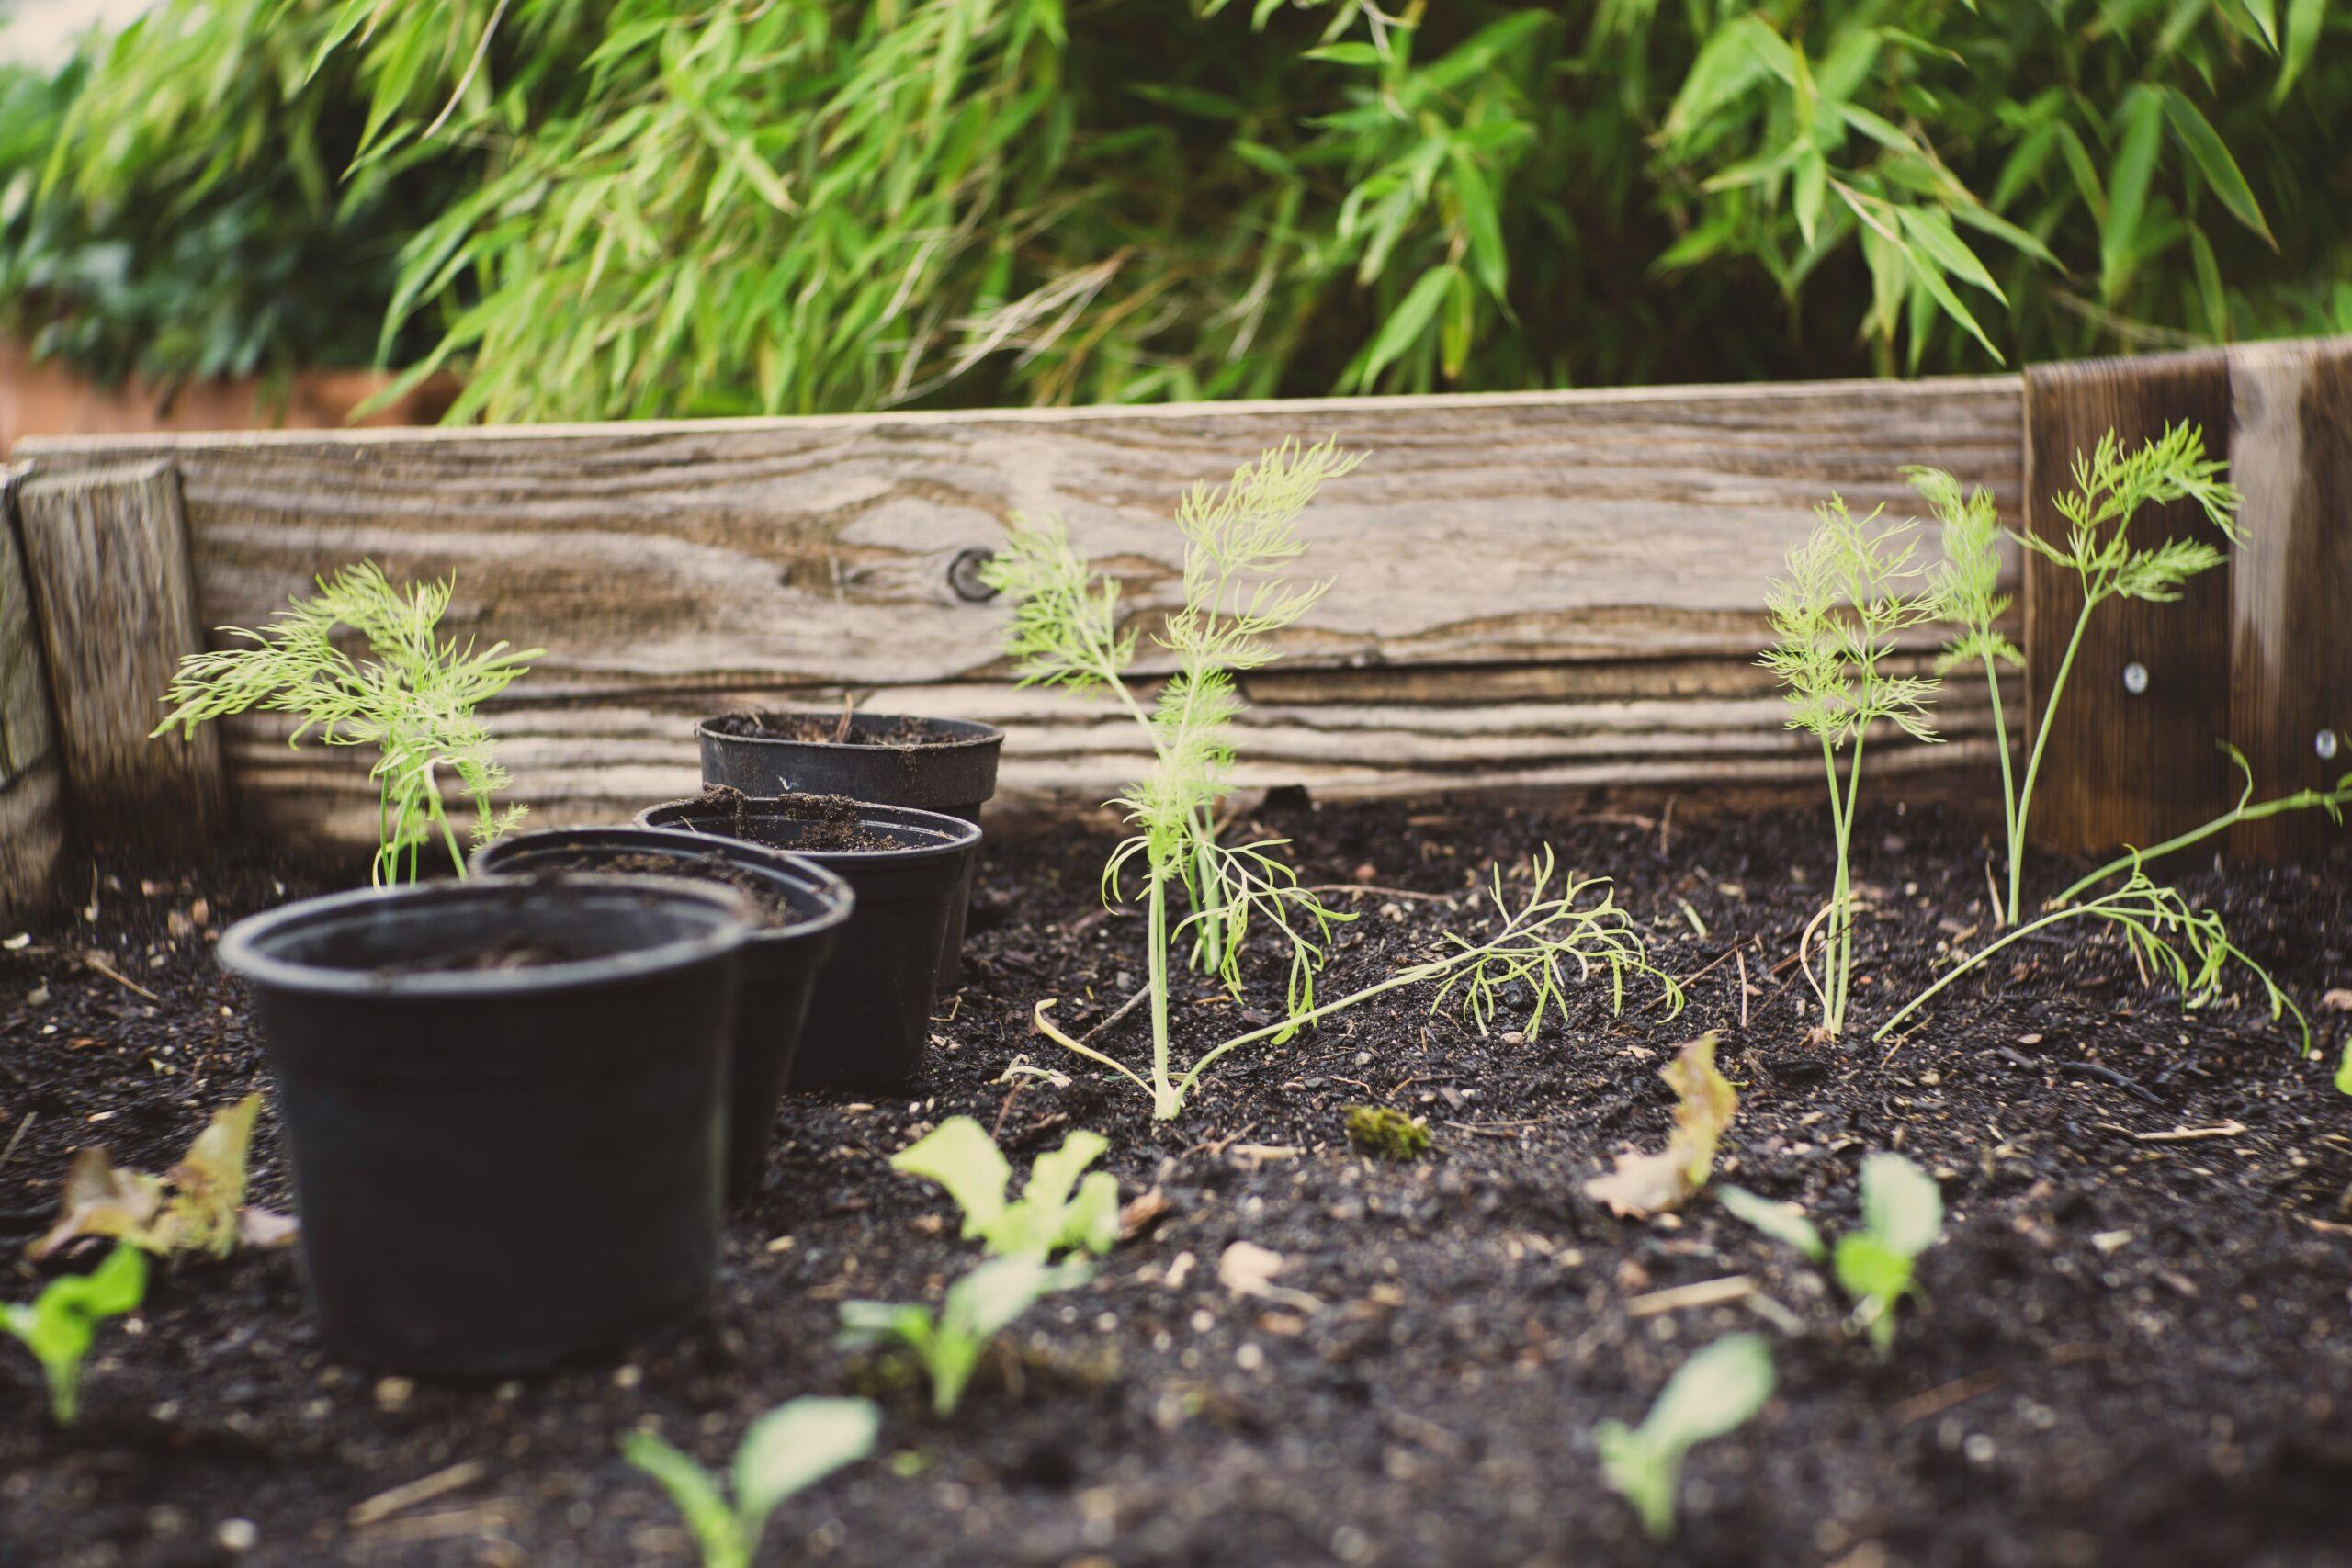 Raised bed planting smart to plan measurement